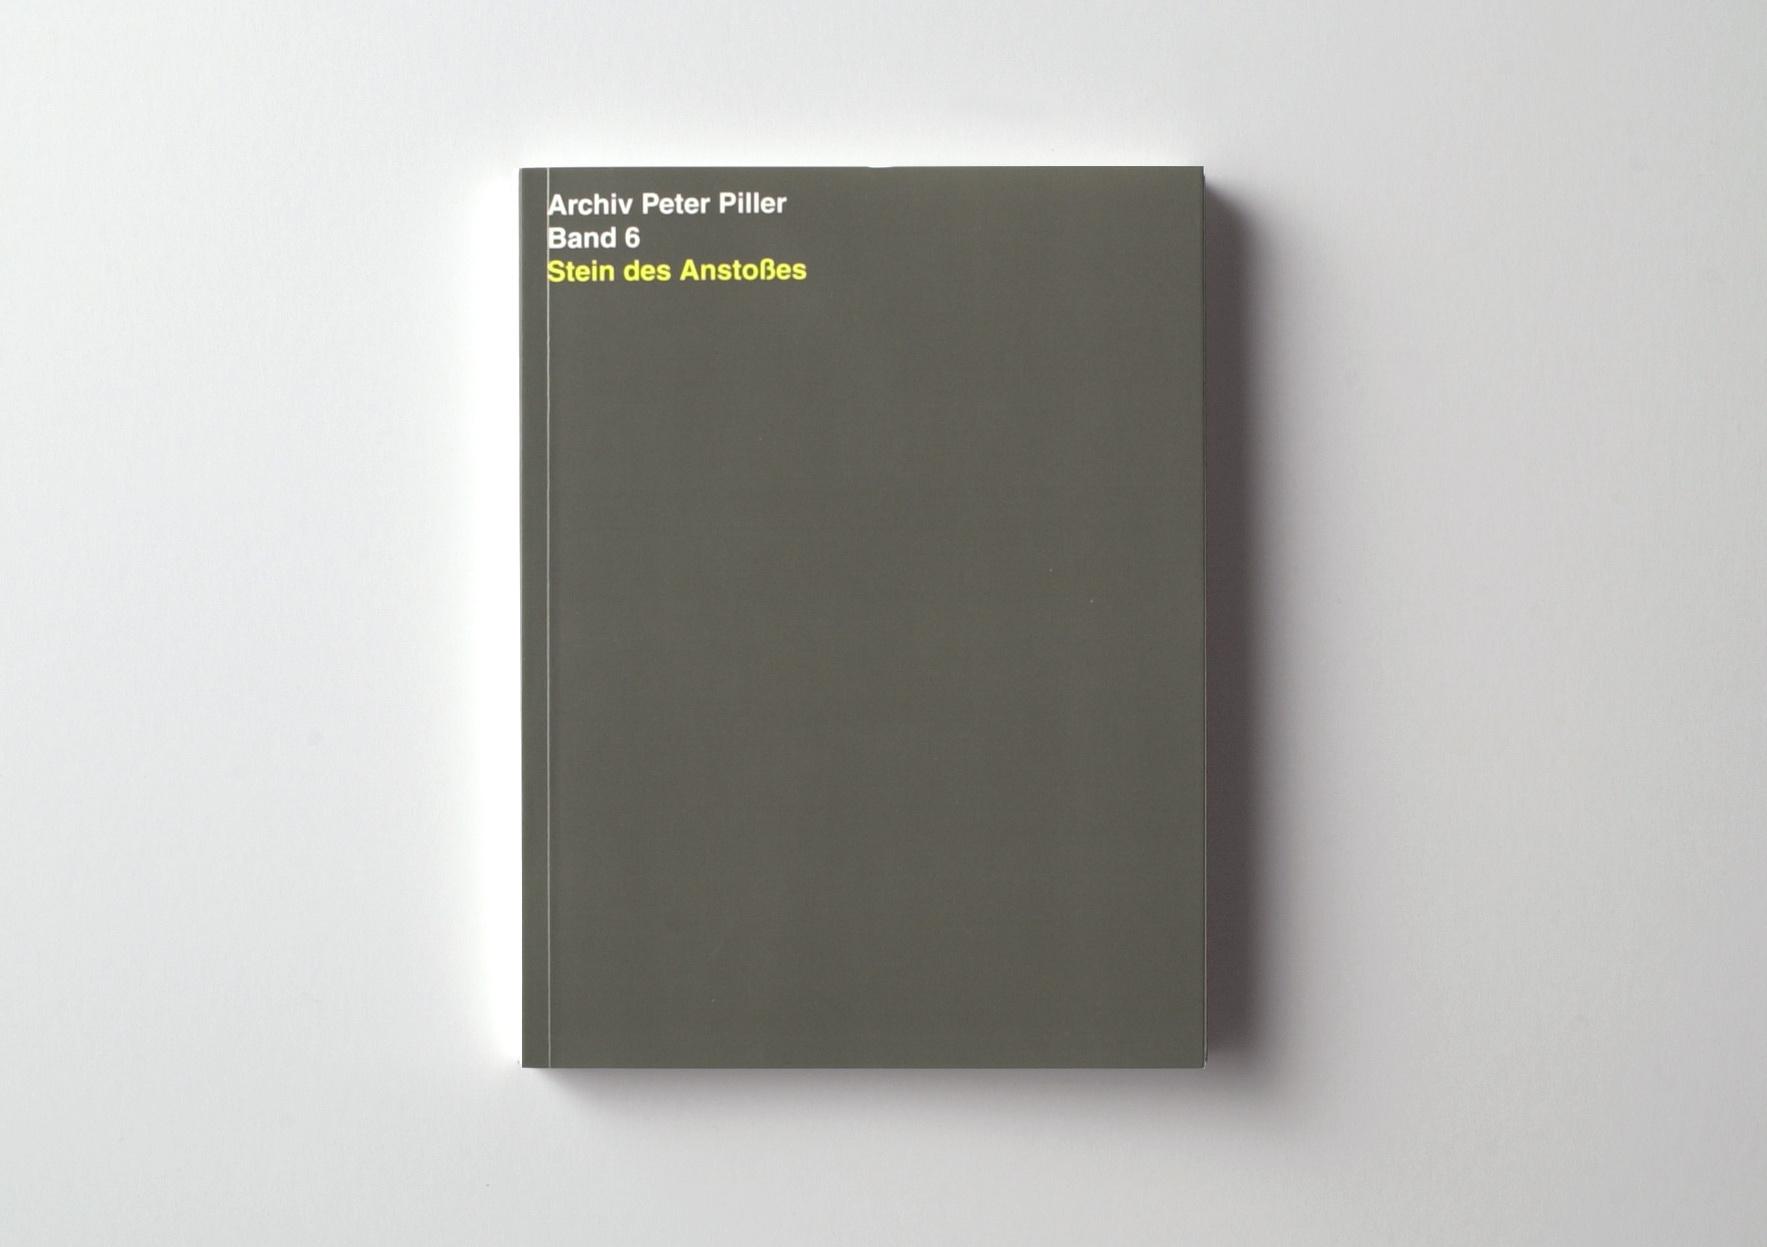 | Archiv Peter Piller Bd. 6: Stein des Anstoßes | ProjecteSD